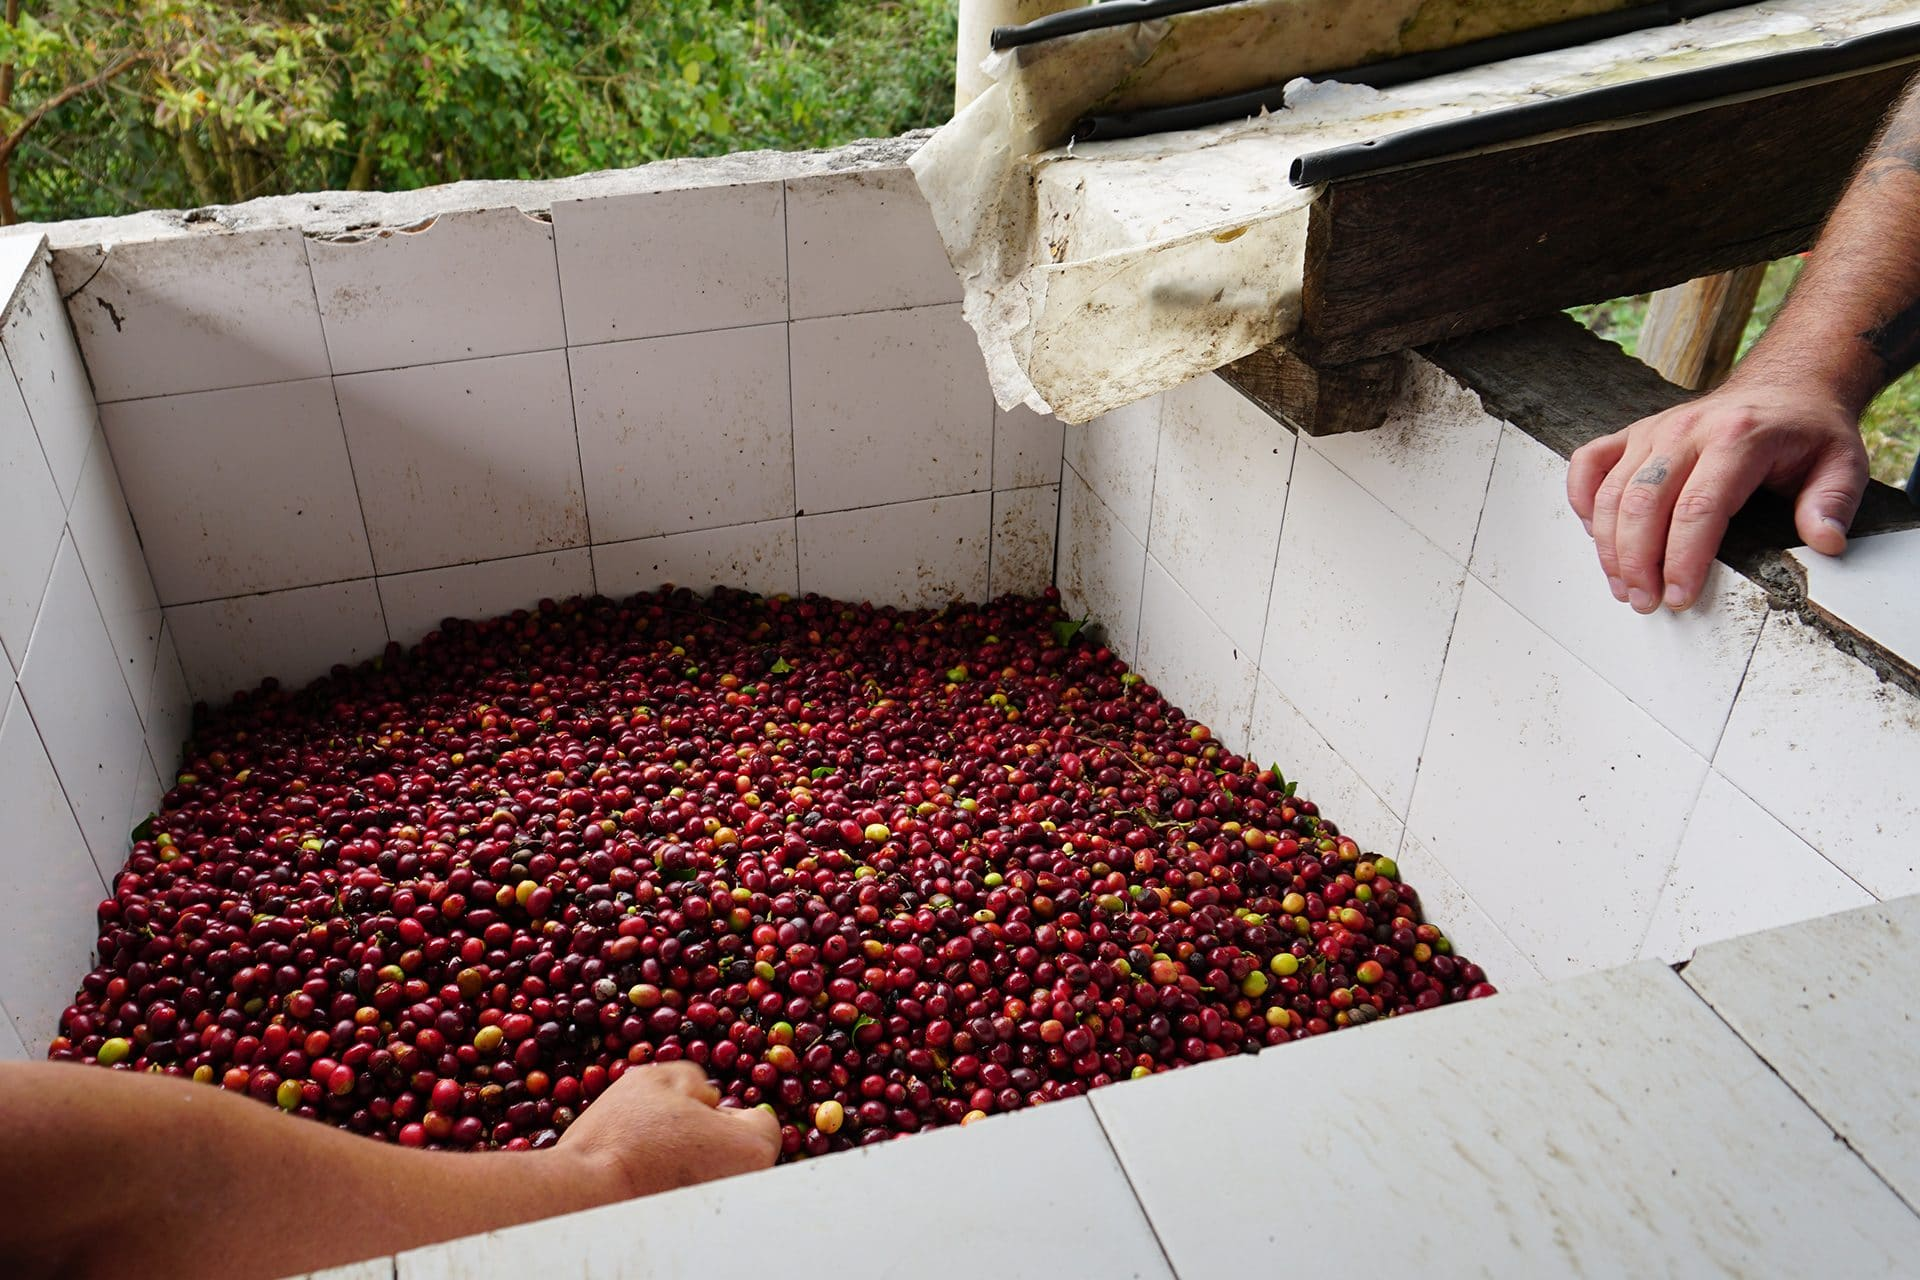 Ripe cherries in a tank on the Guarnizo family farm